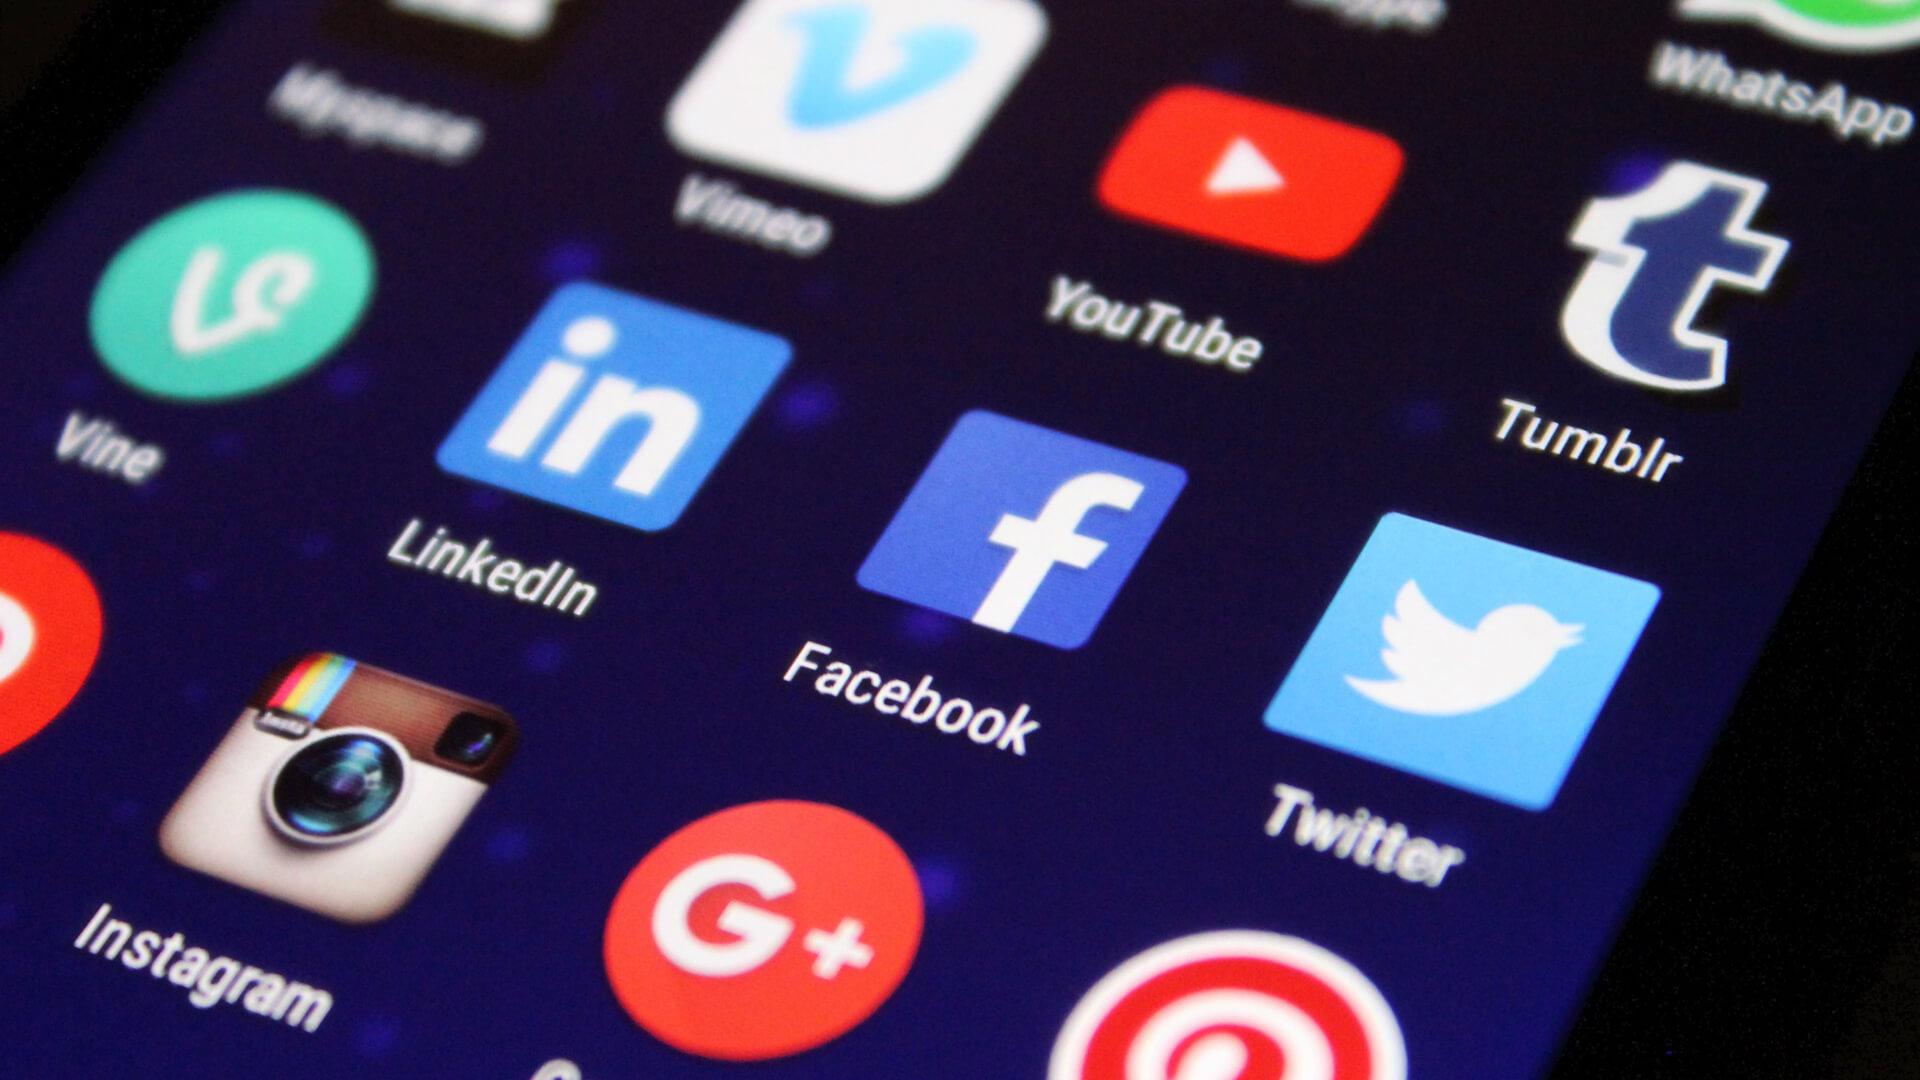 apps, smartphone, social media